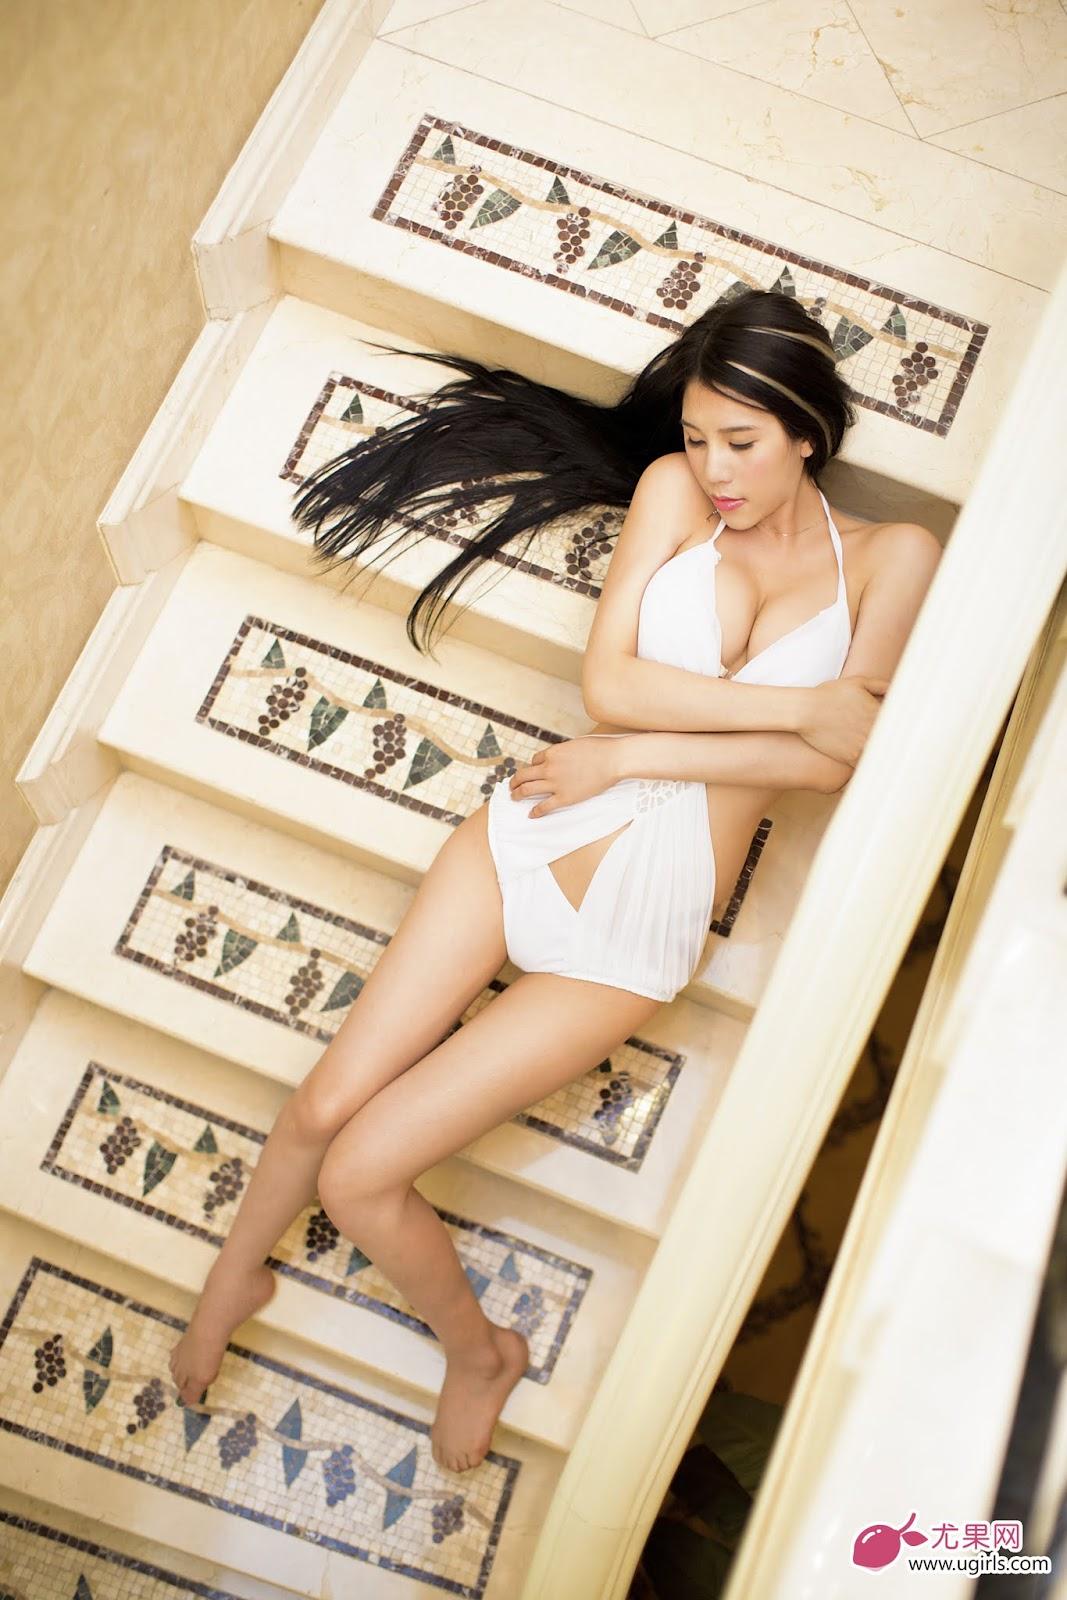 EZ0A8643 2 - Ugirls No.023 Model: 南湘baby Great Tits